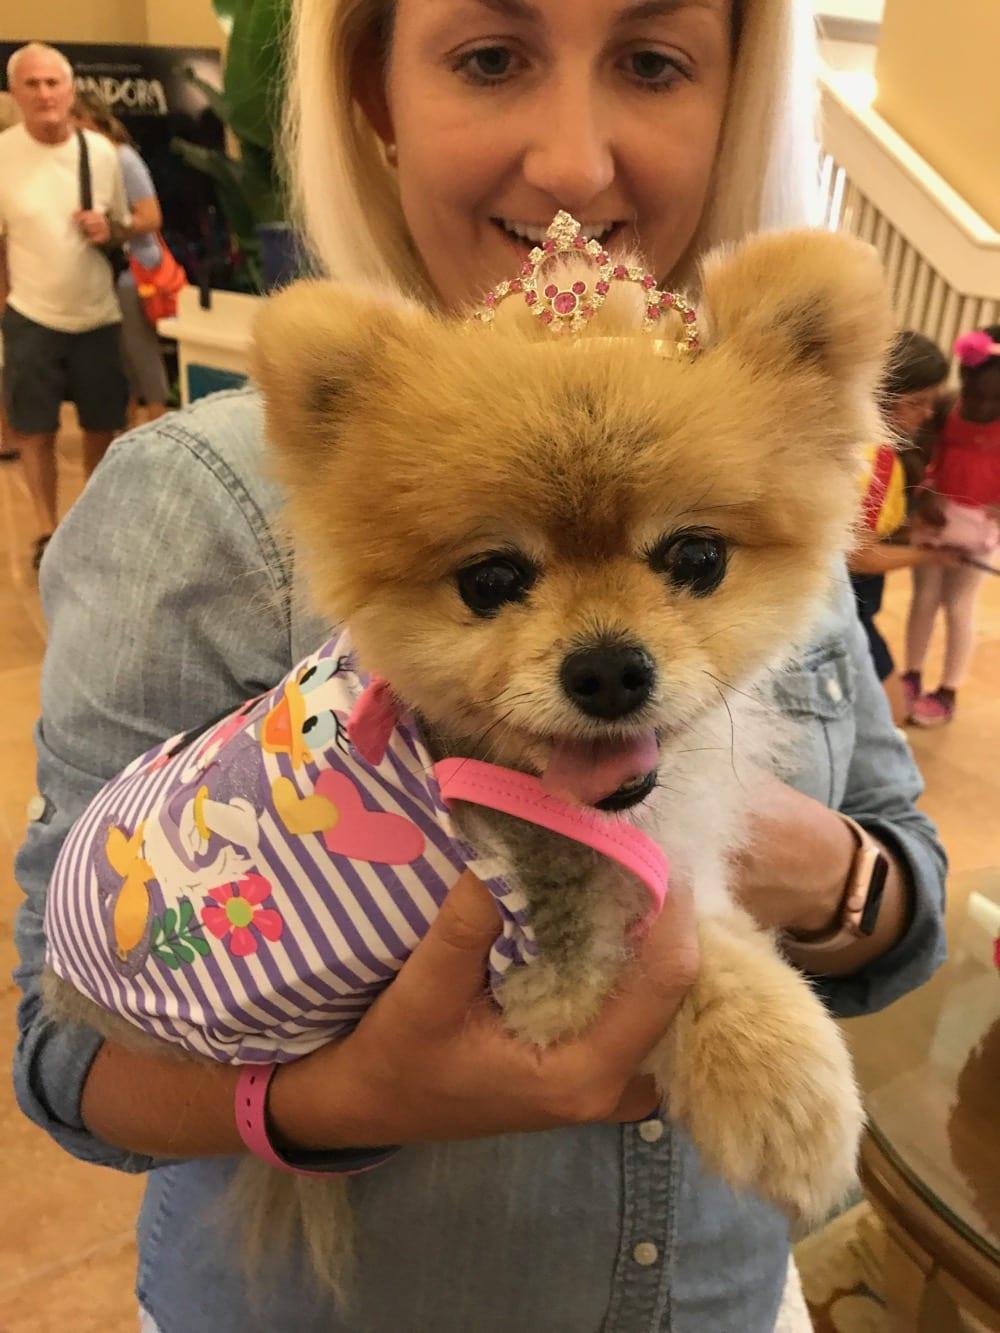 Dogs Allowed In Certain Walt Disney World Resorts Ziggy